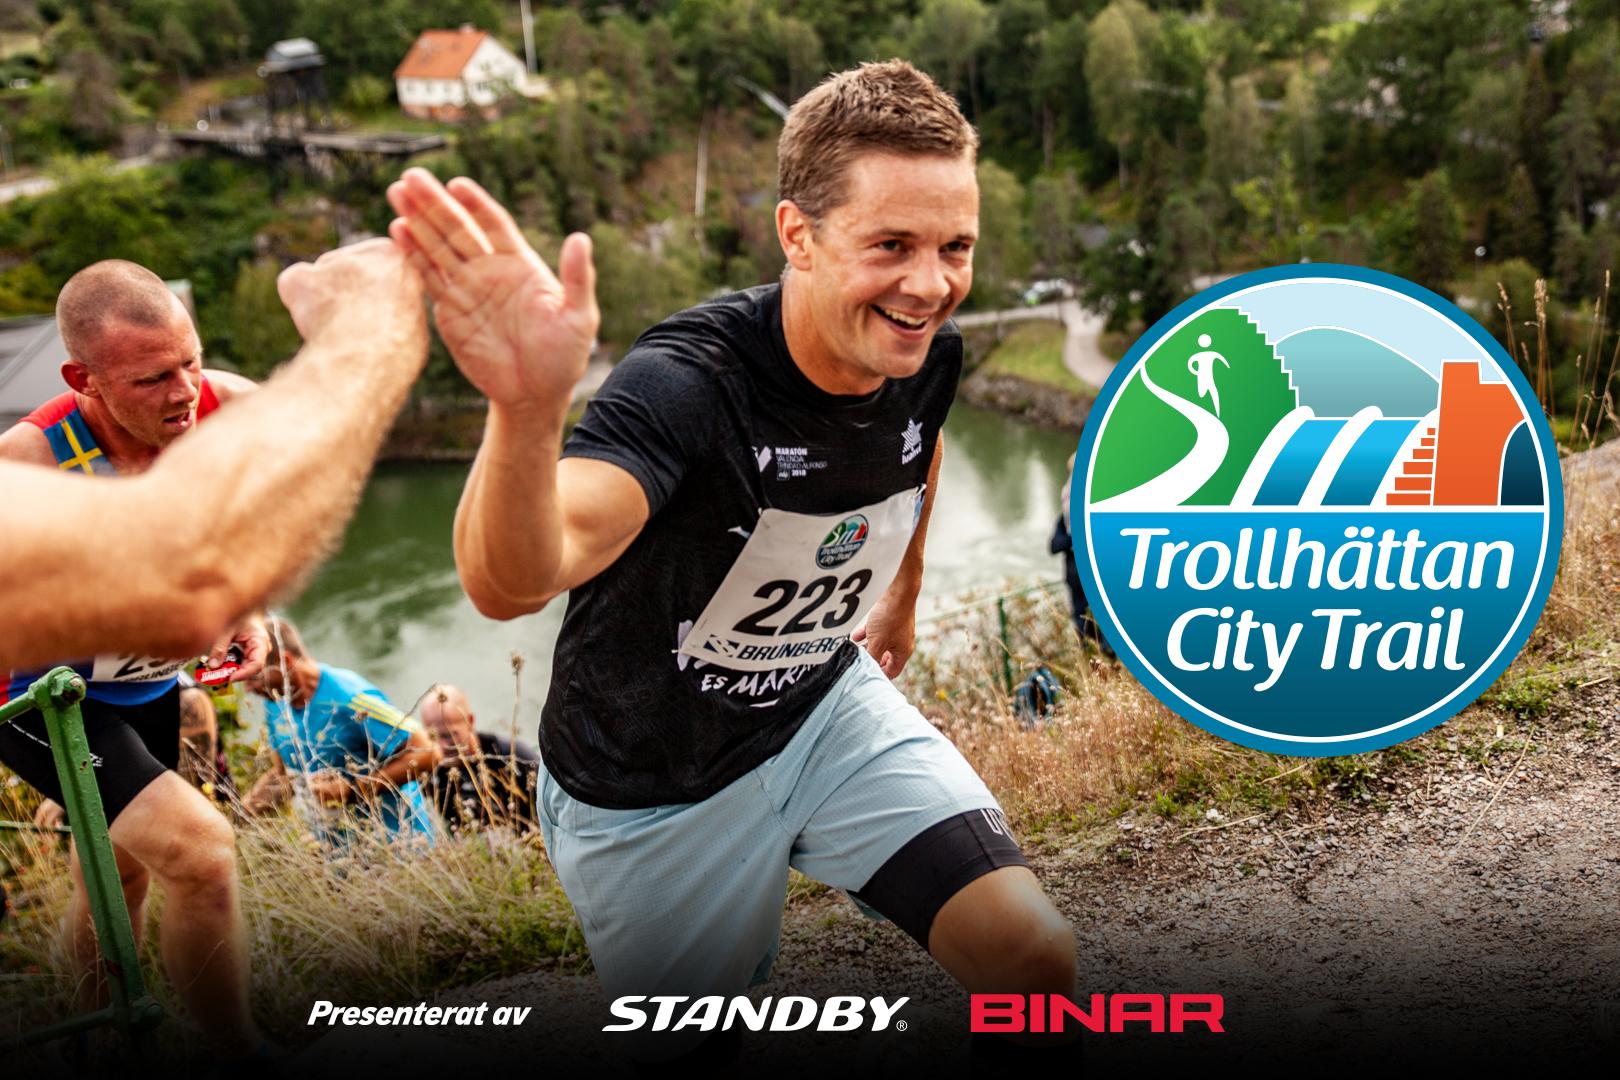 Trollhättan City Trail